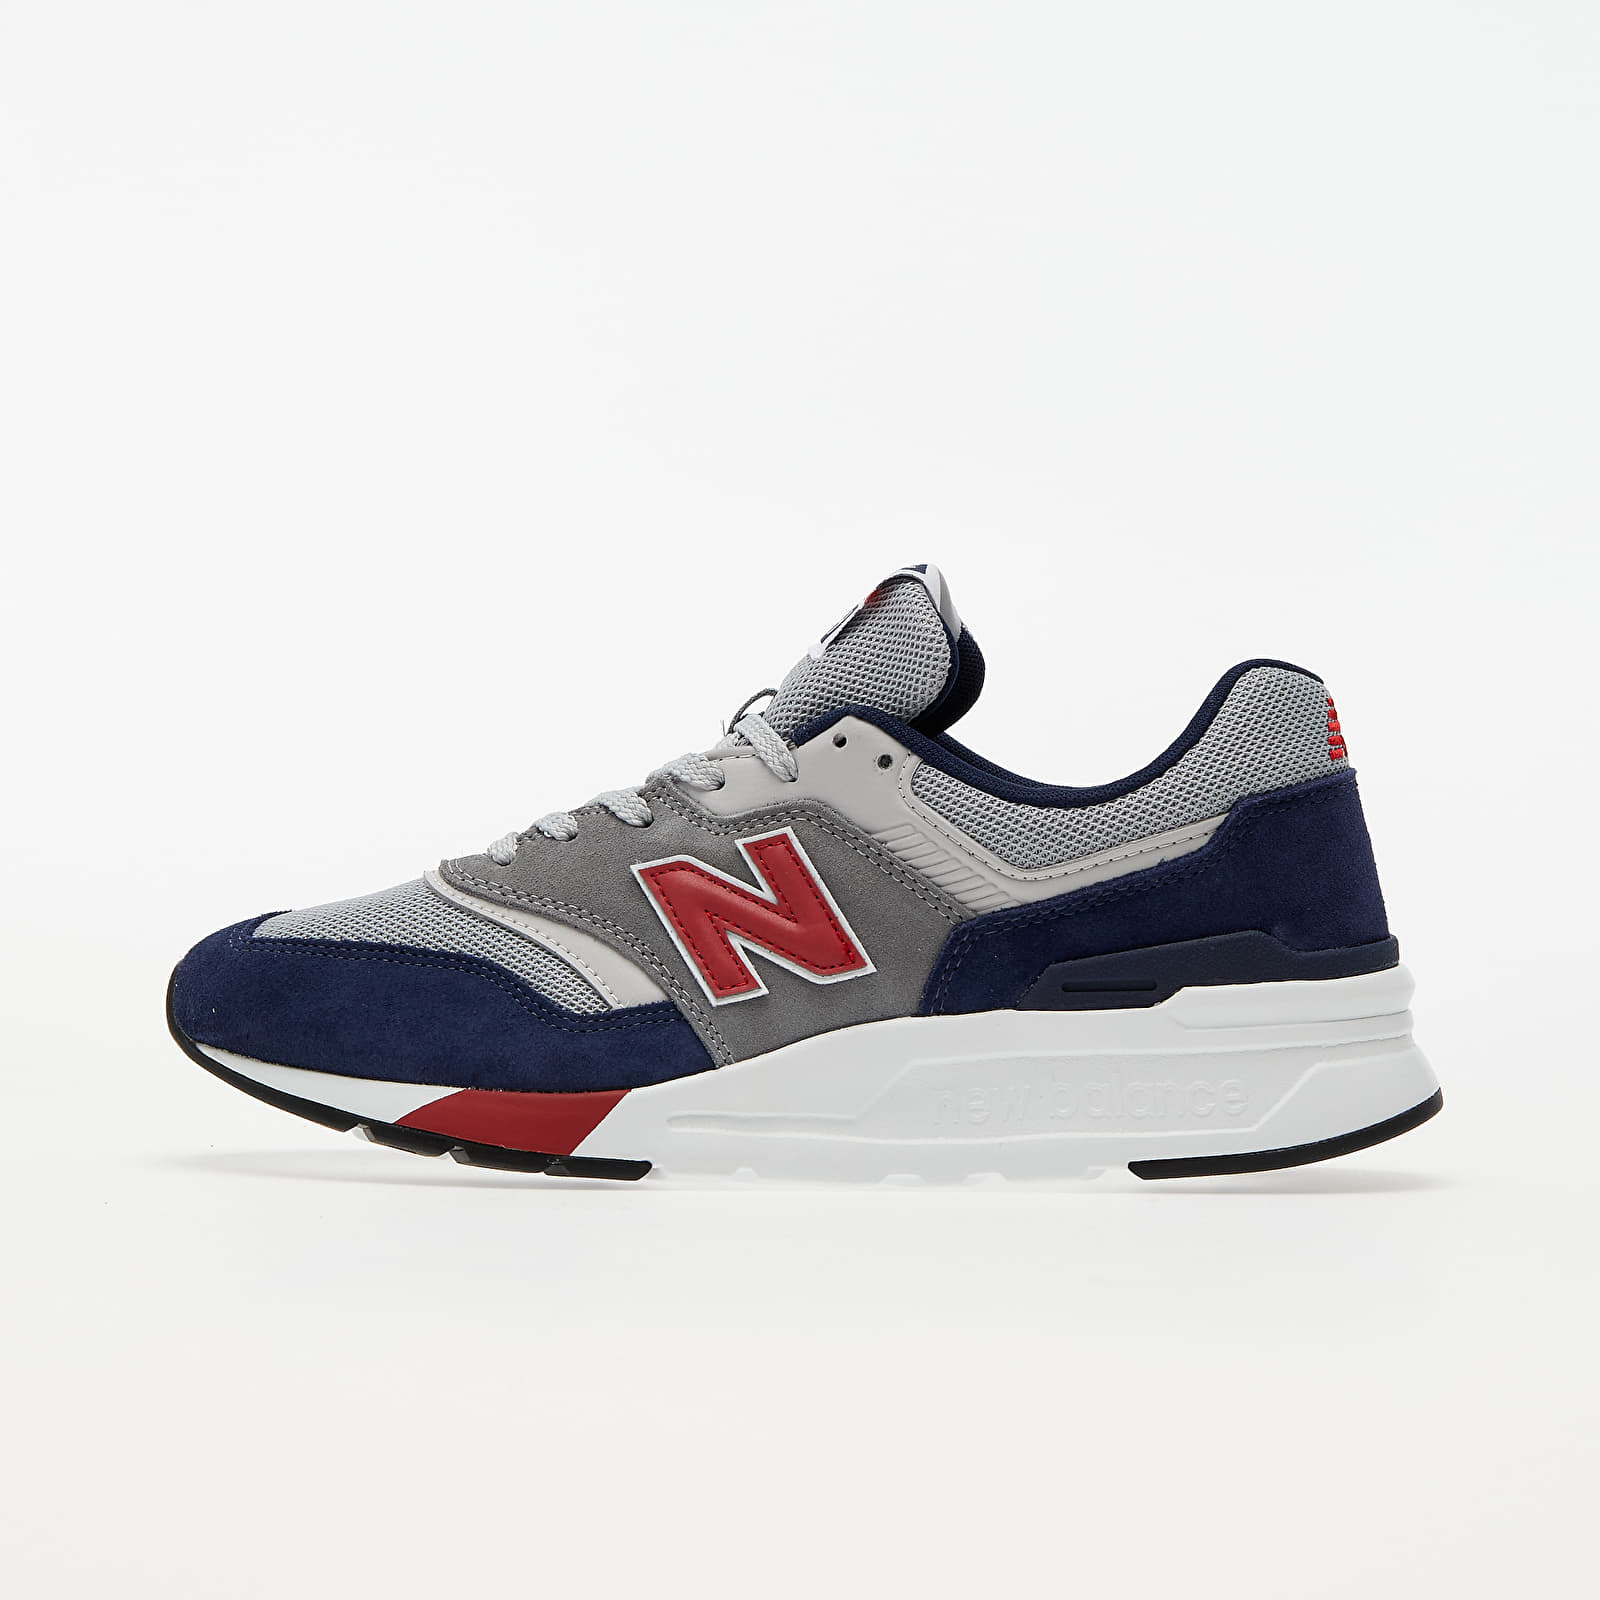 New Balance 997 Blue/ Grey/ Red CM997HVR